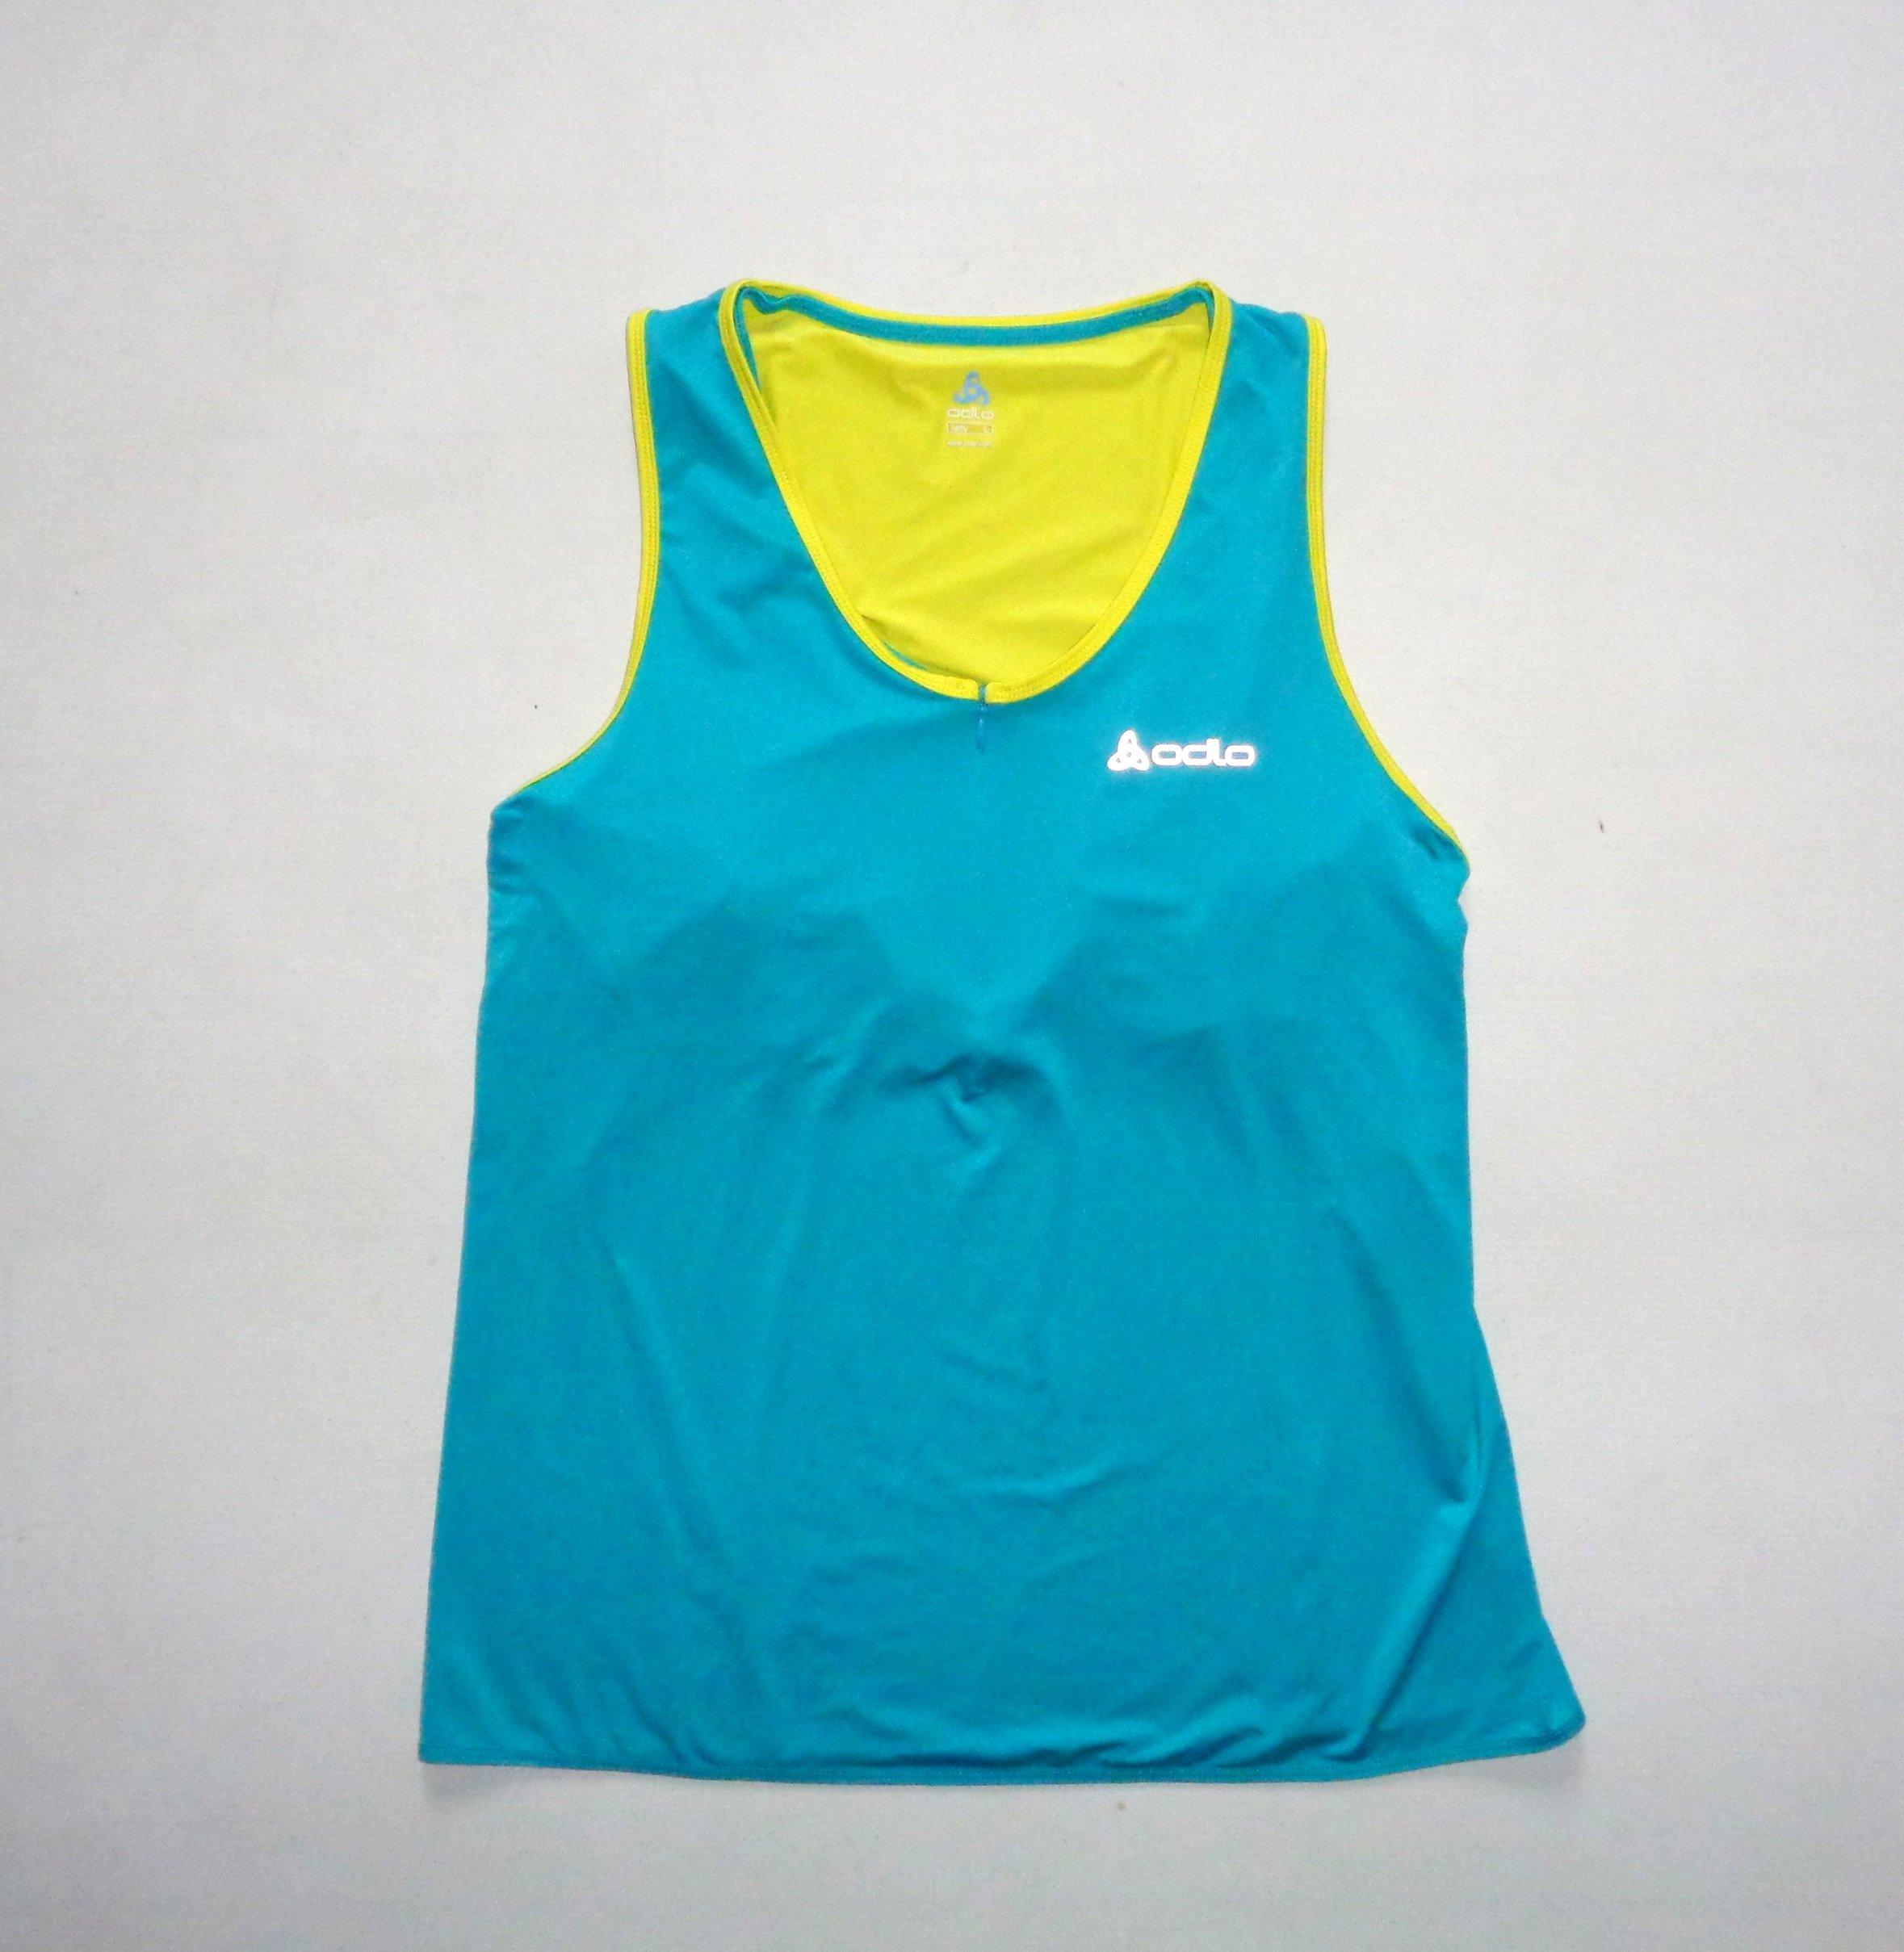 ODLO SINGLET RACE koszulka damska do biegania L